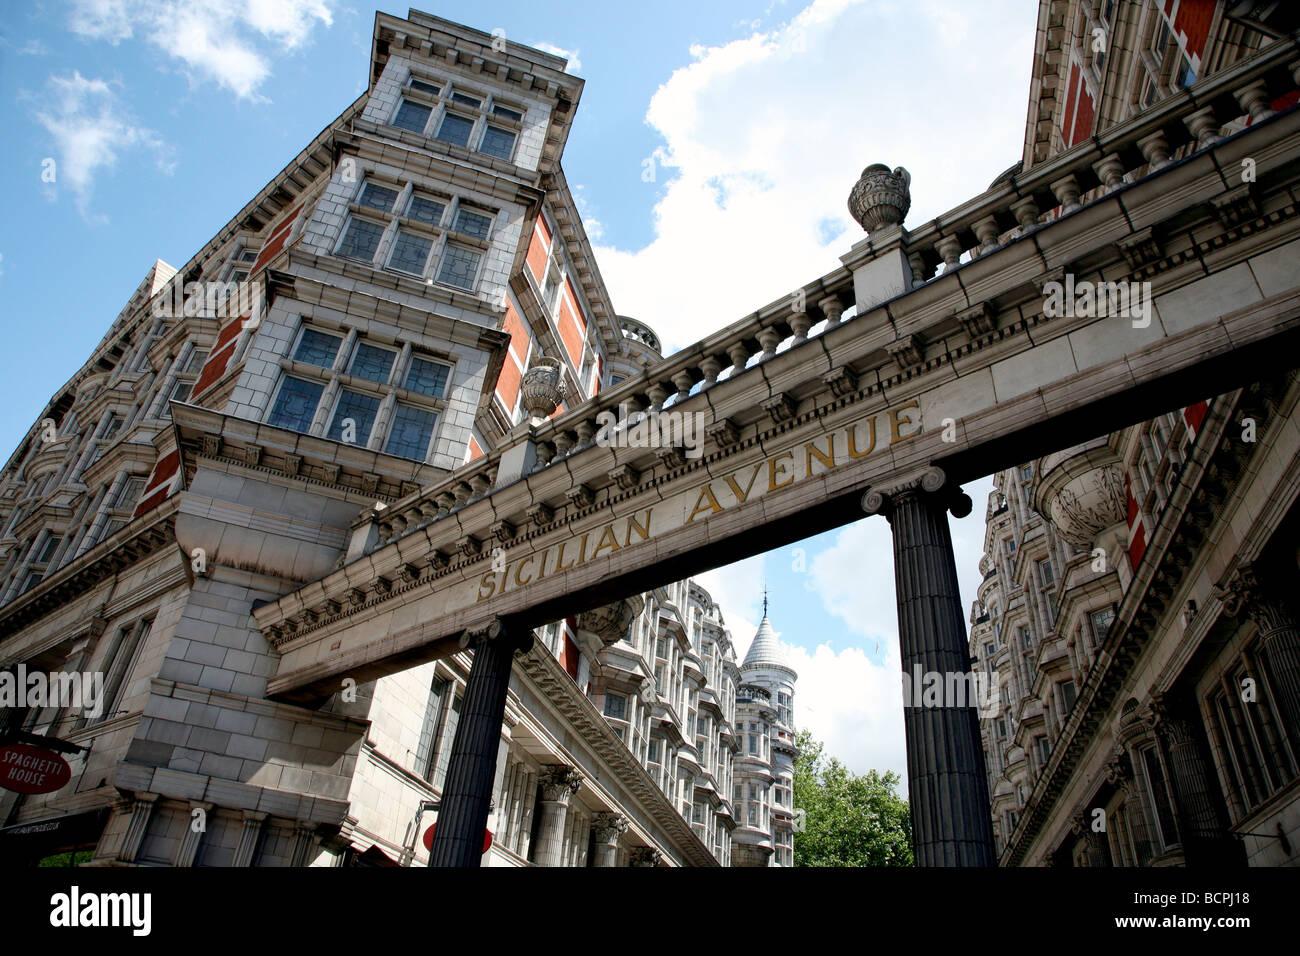 Sicilian Avenue, Holborn, London - Stock Image